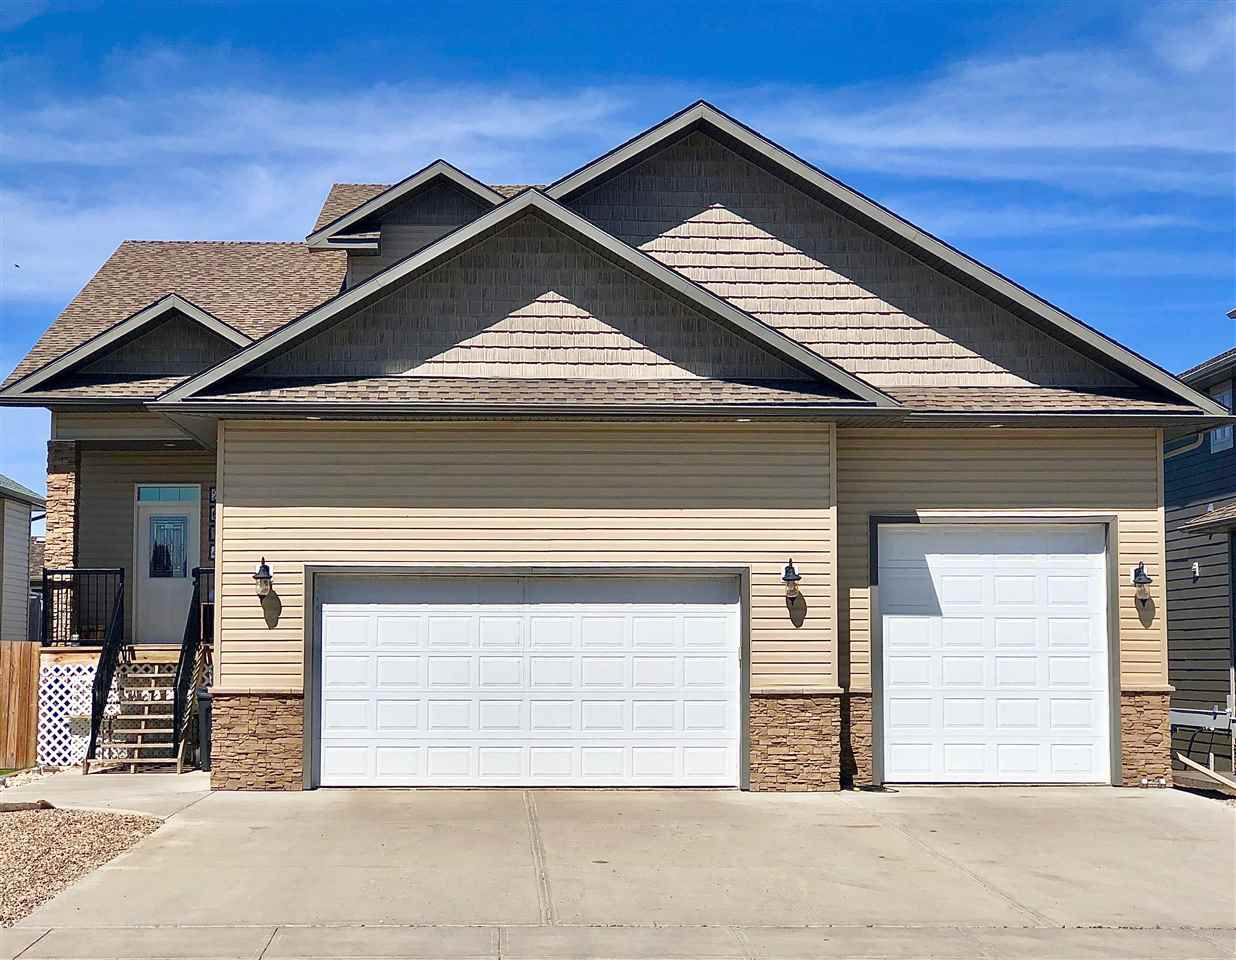 Main Photo: 2614 Lake Avenue: Cold Lake House for sale : MLS®# E4157587